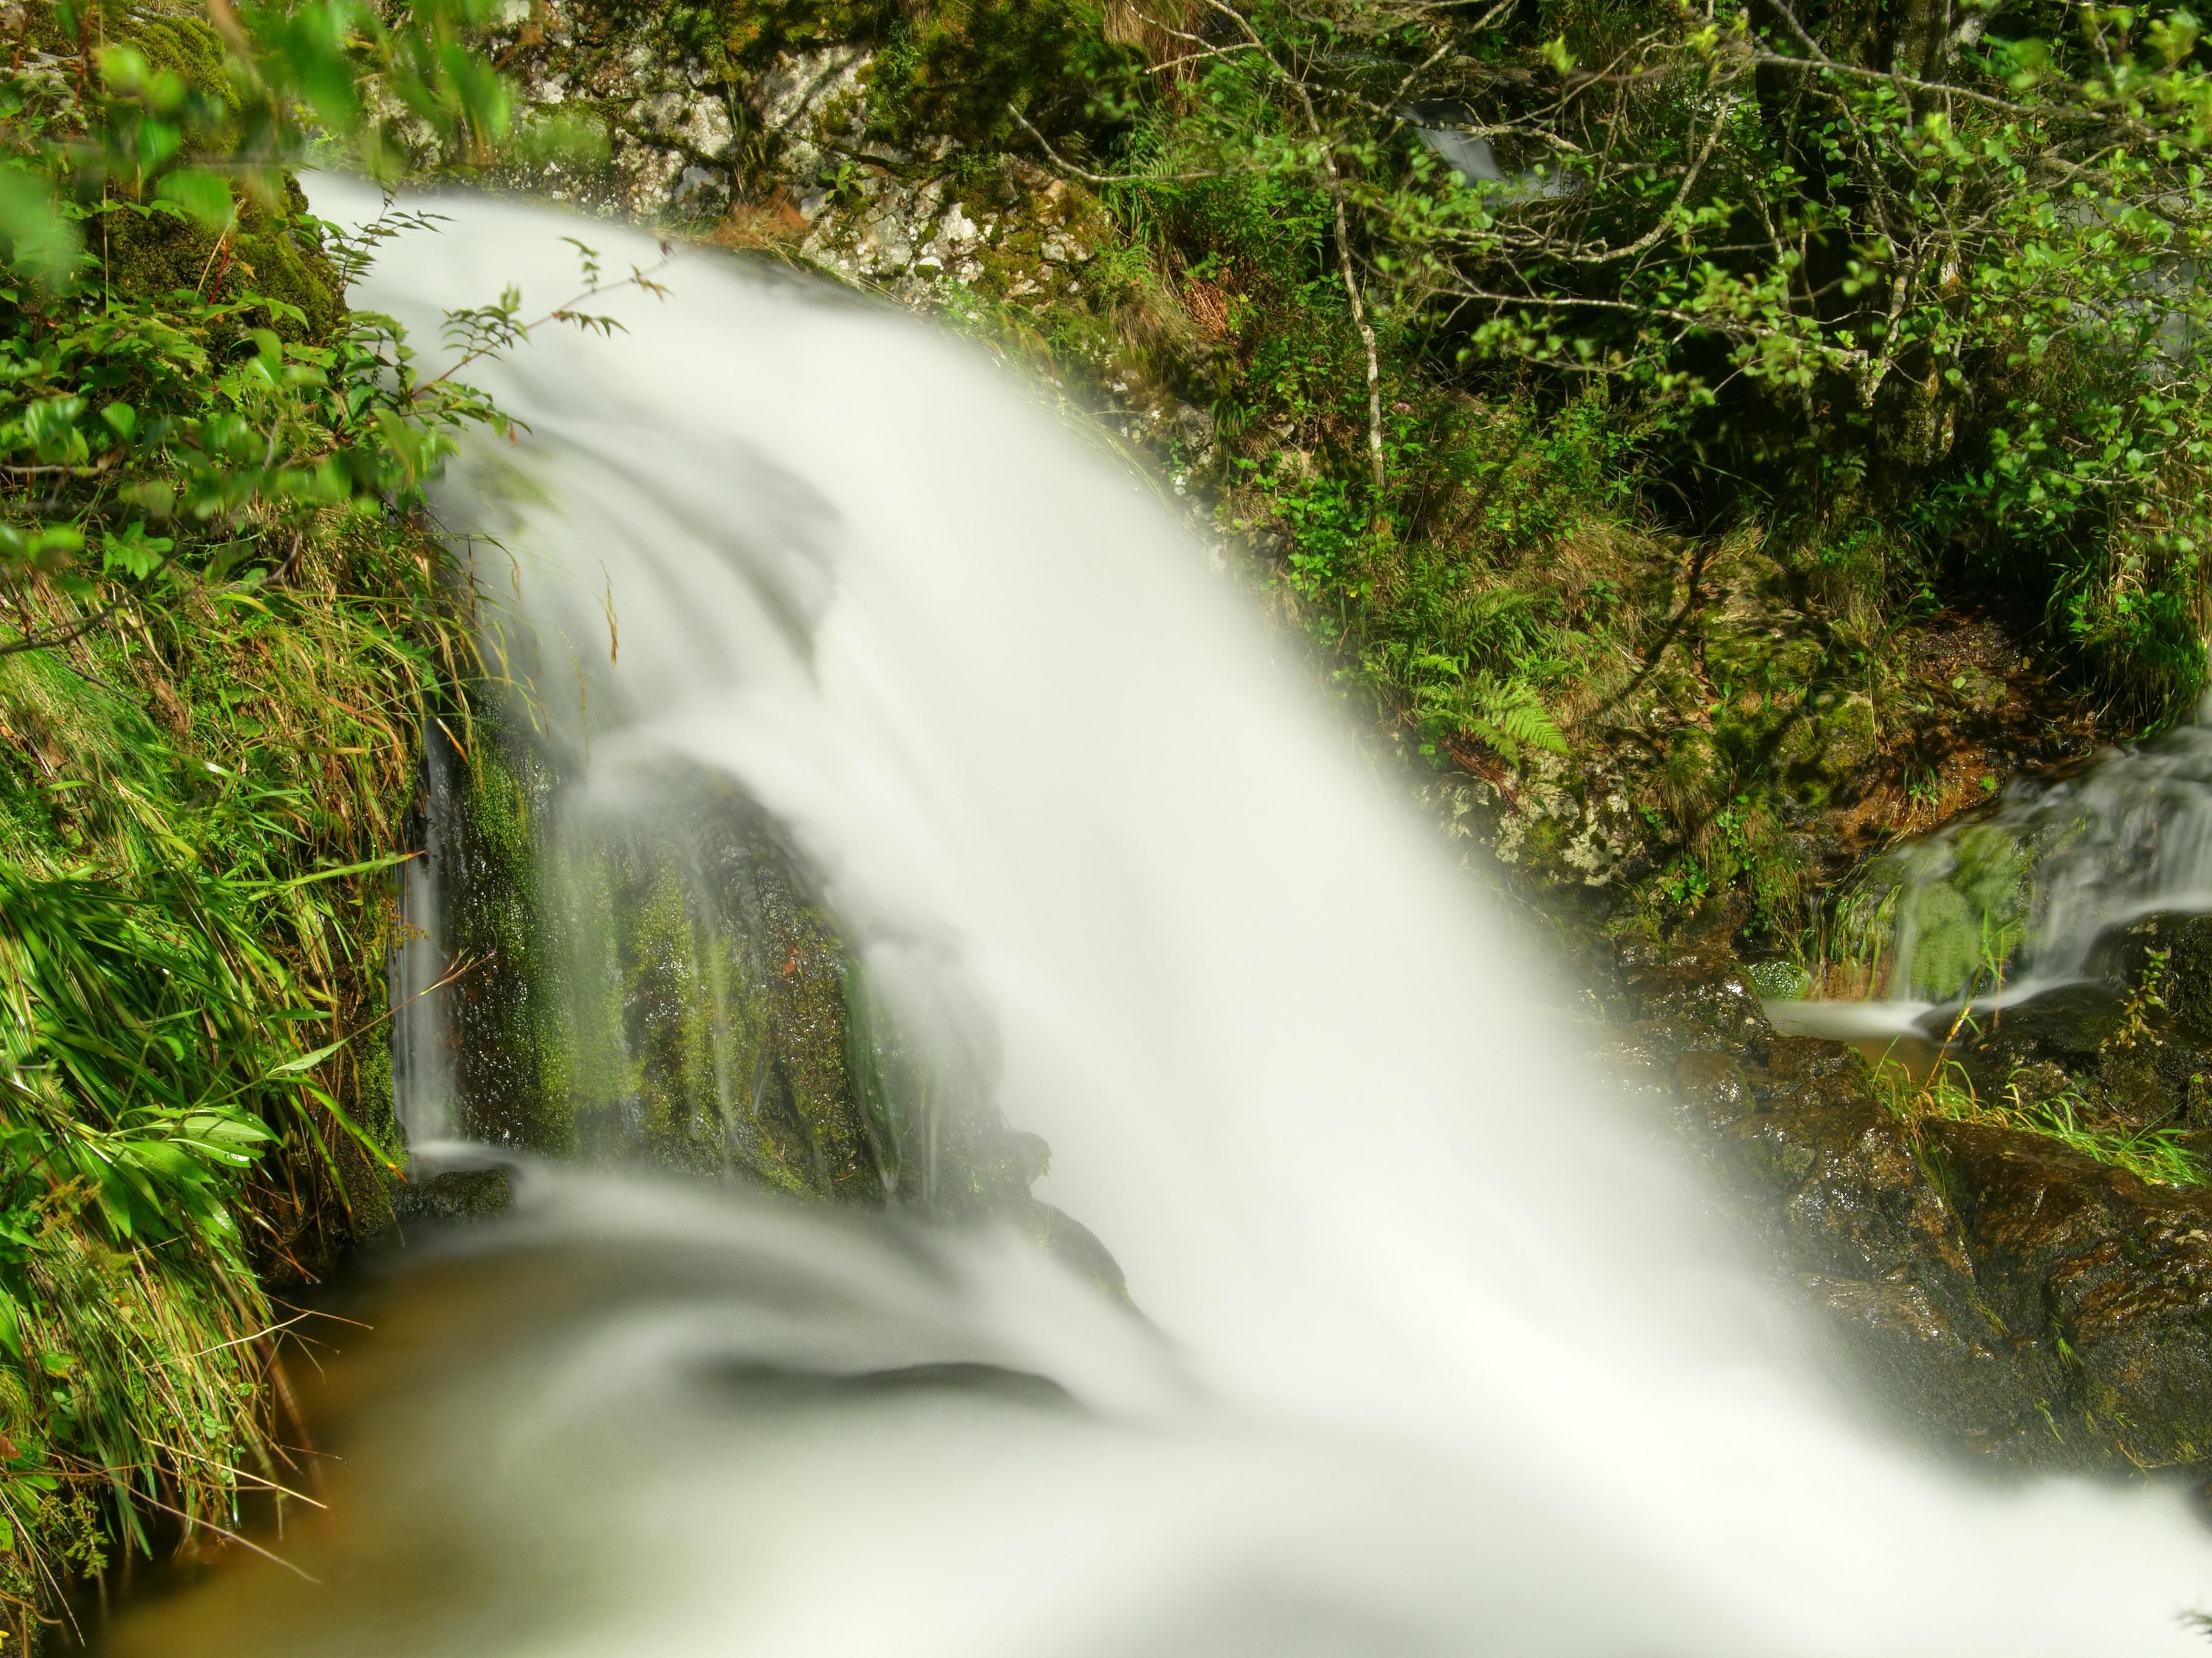 Vosges du Sud, Territory of Belfort, France